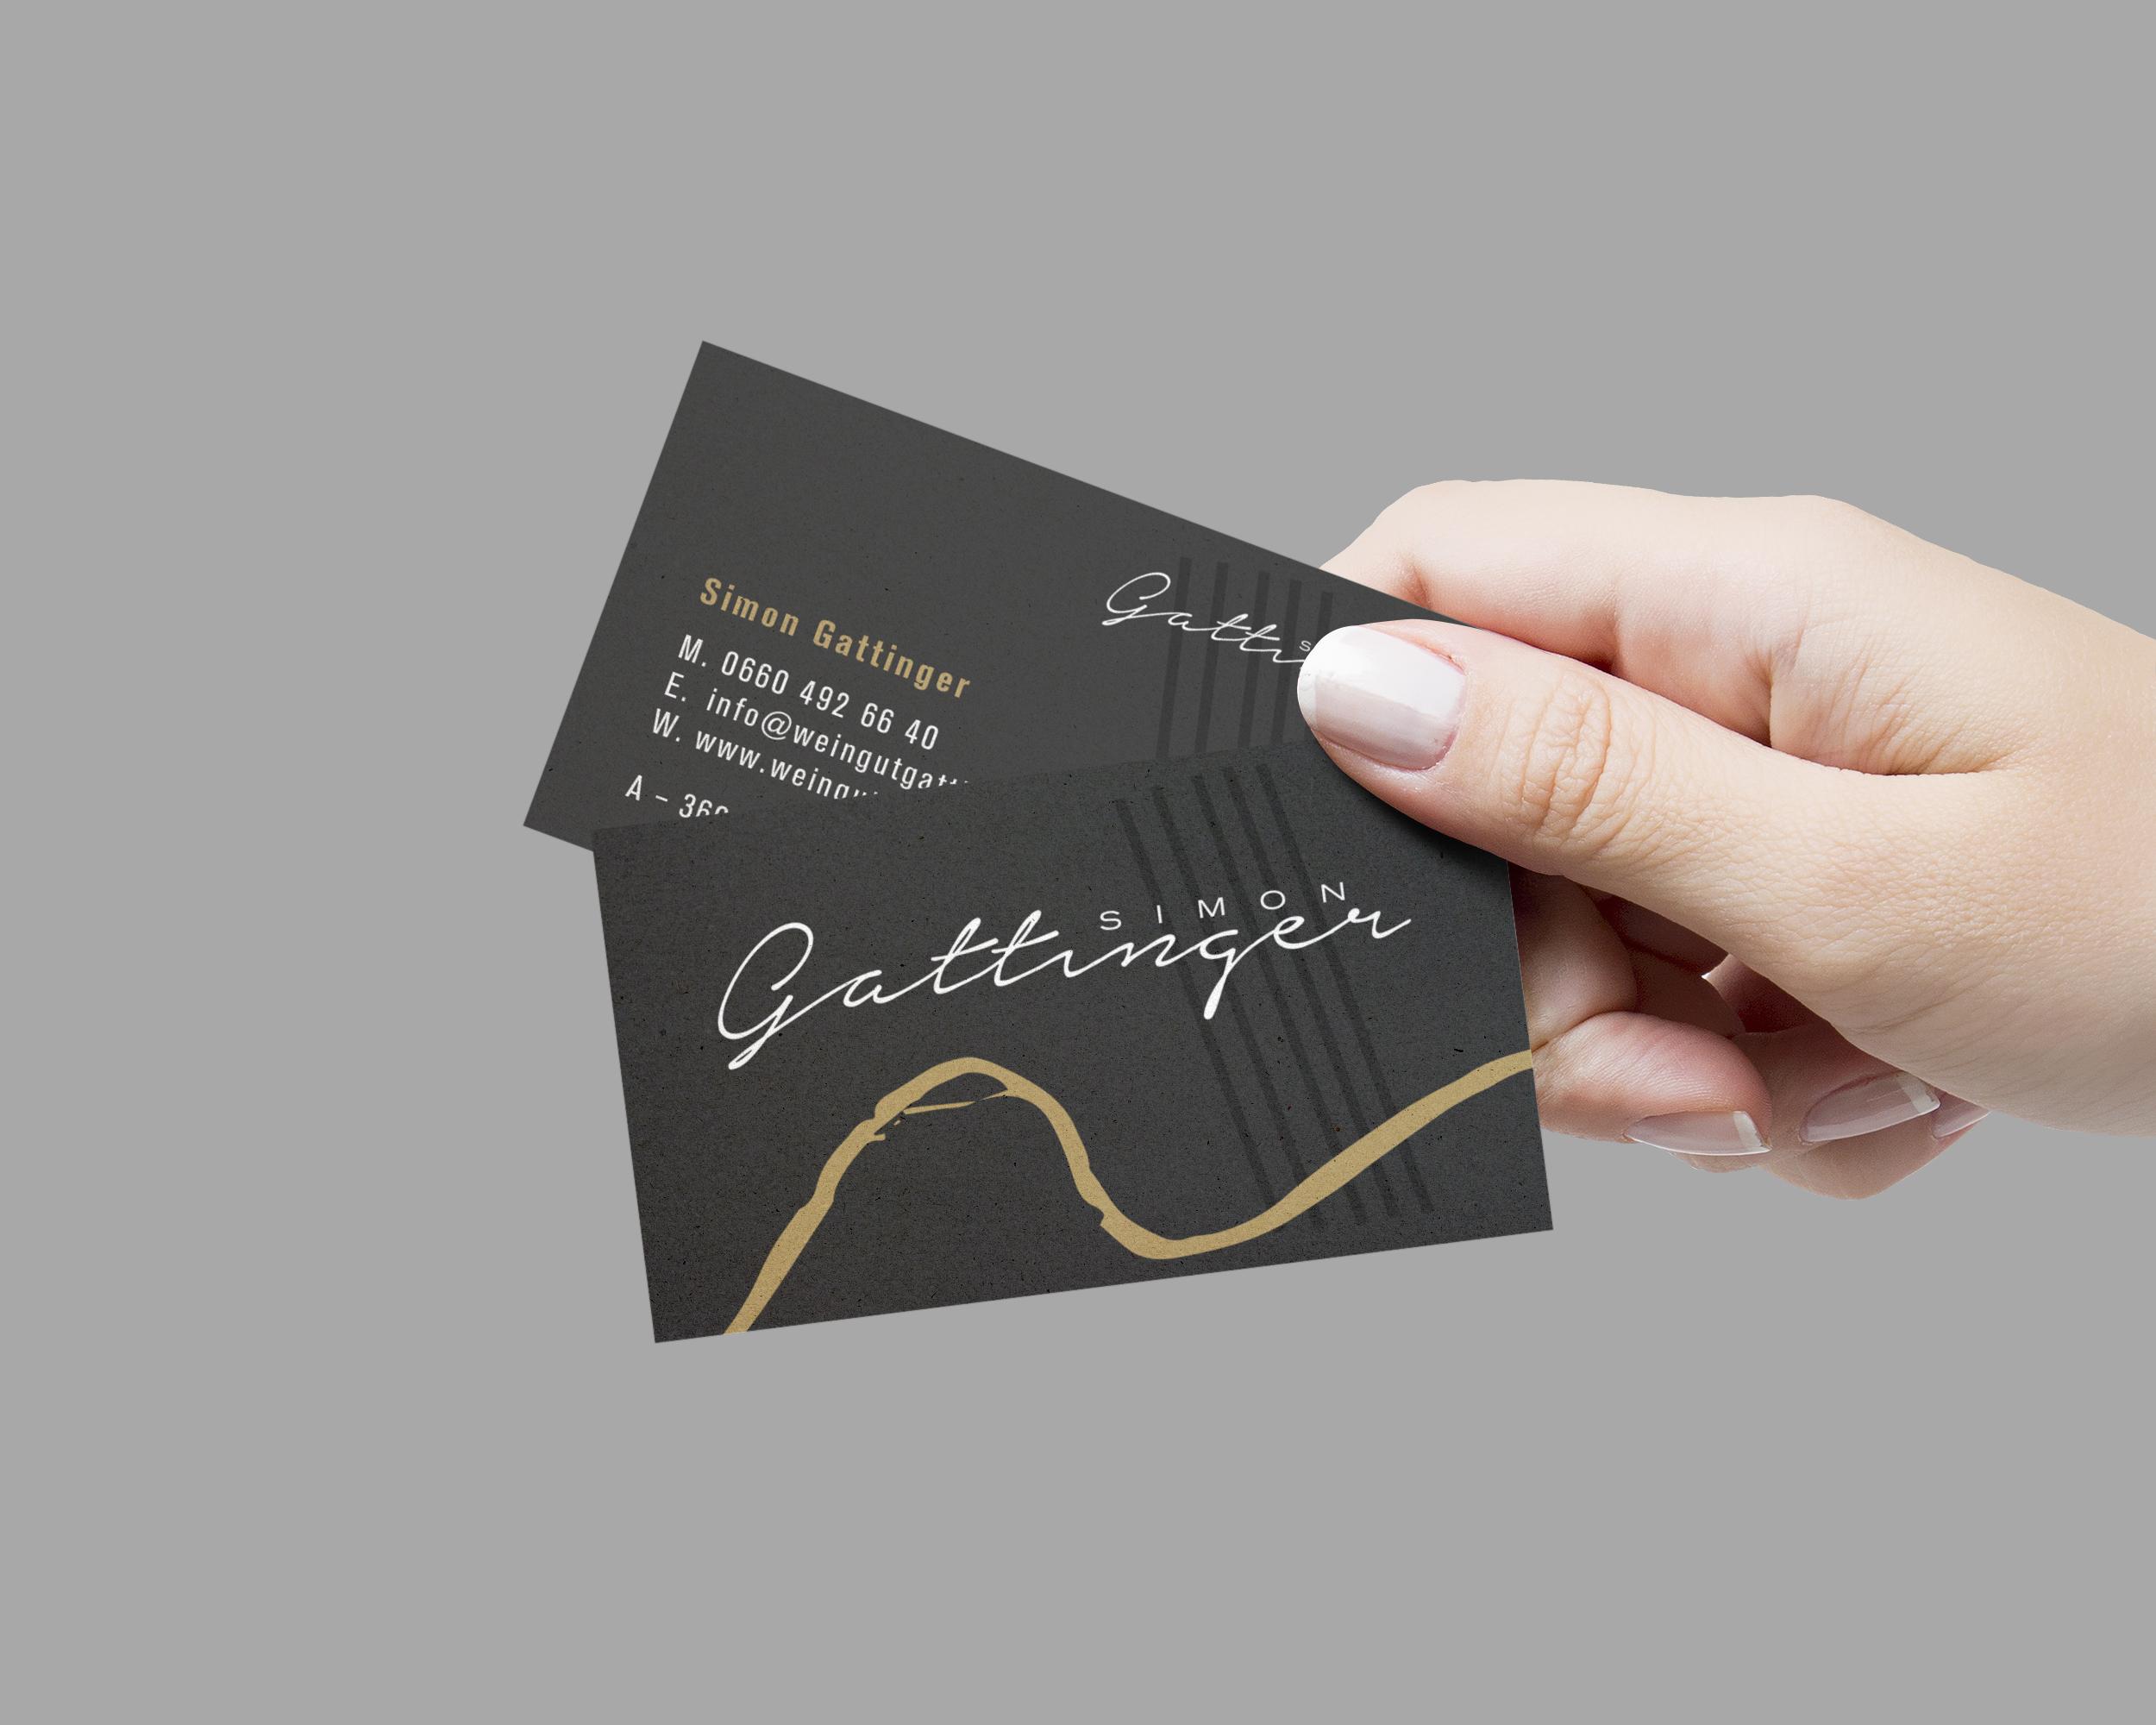 gattinger-Business Card Hand.jpg